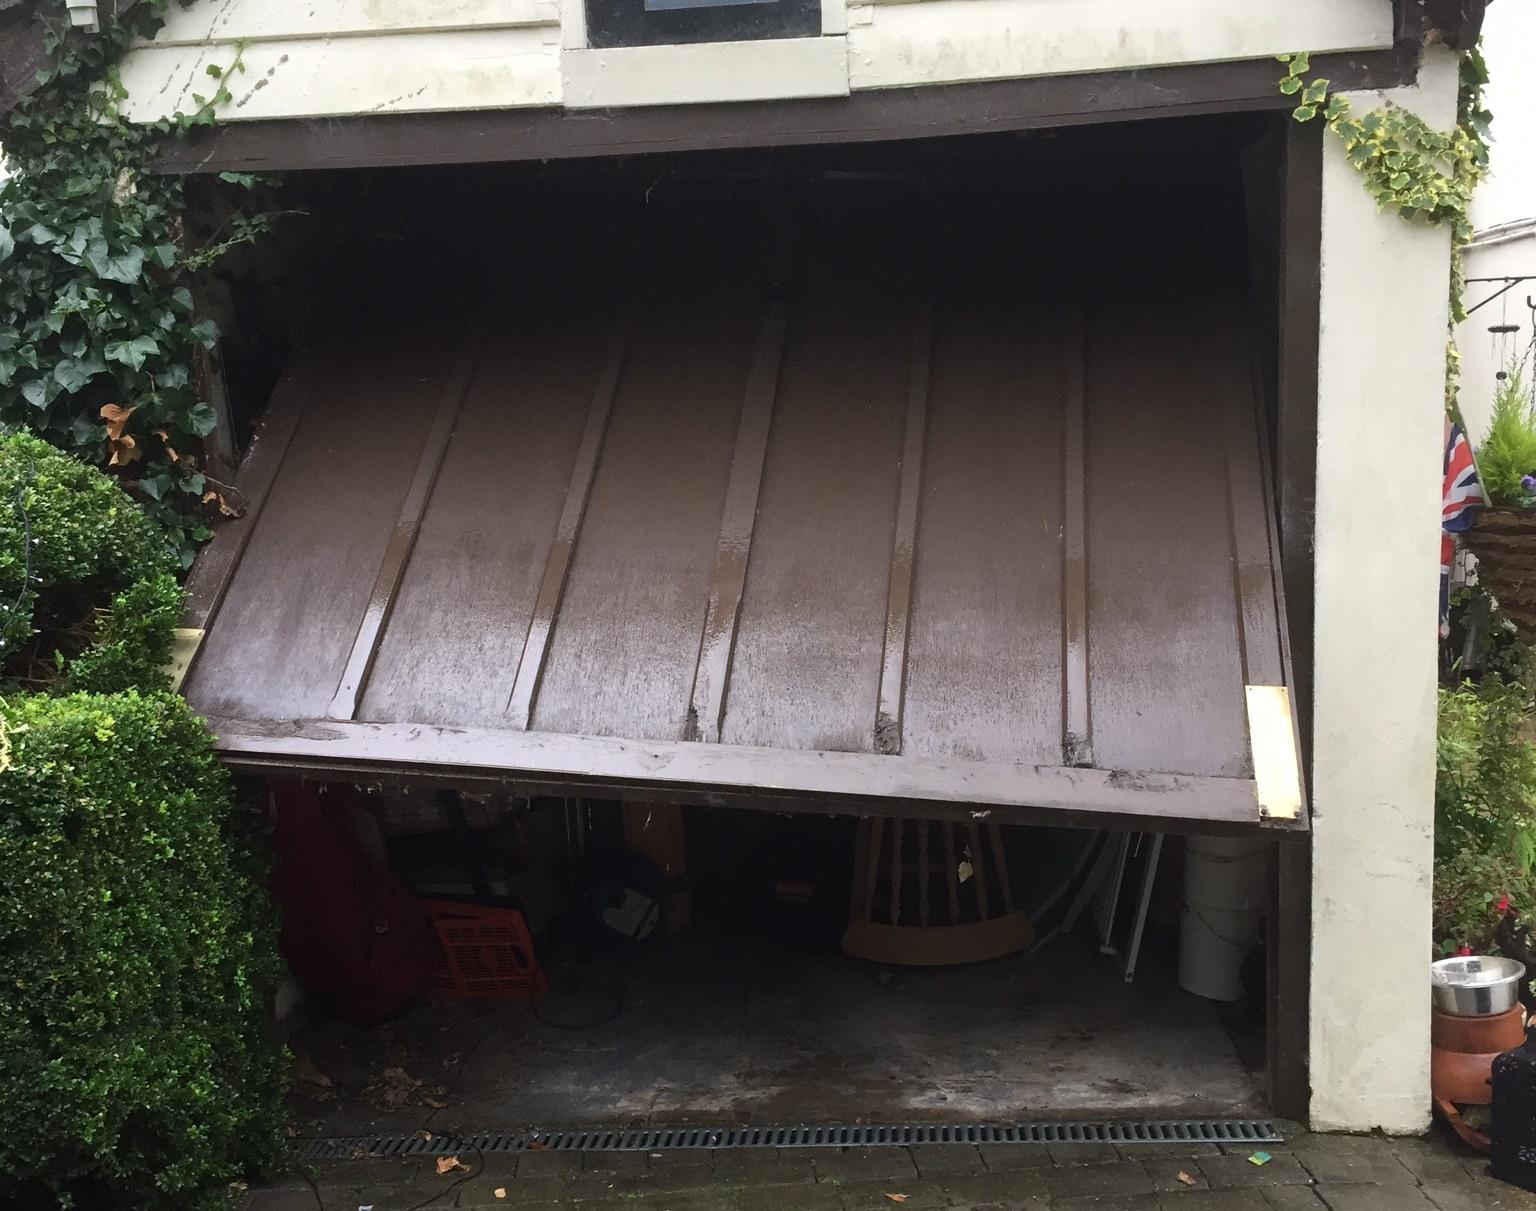 Spares repairs elite gd garage door repairs rubansaba